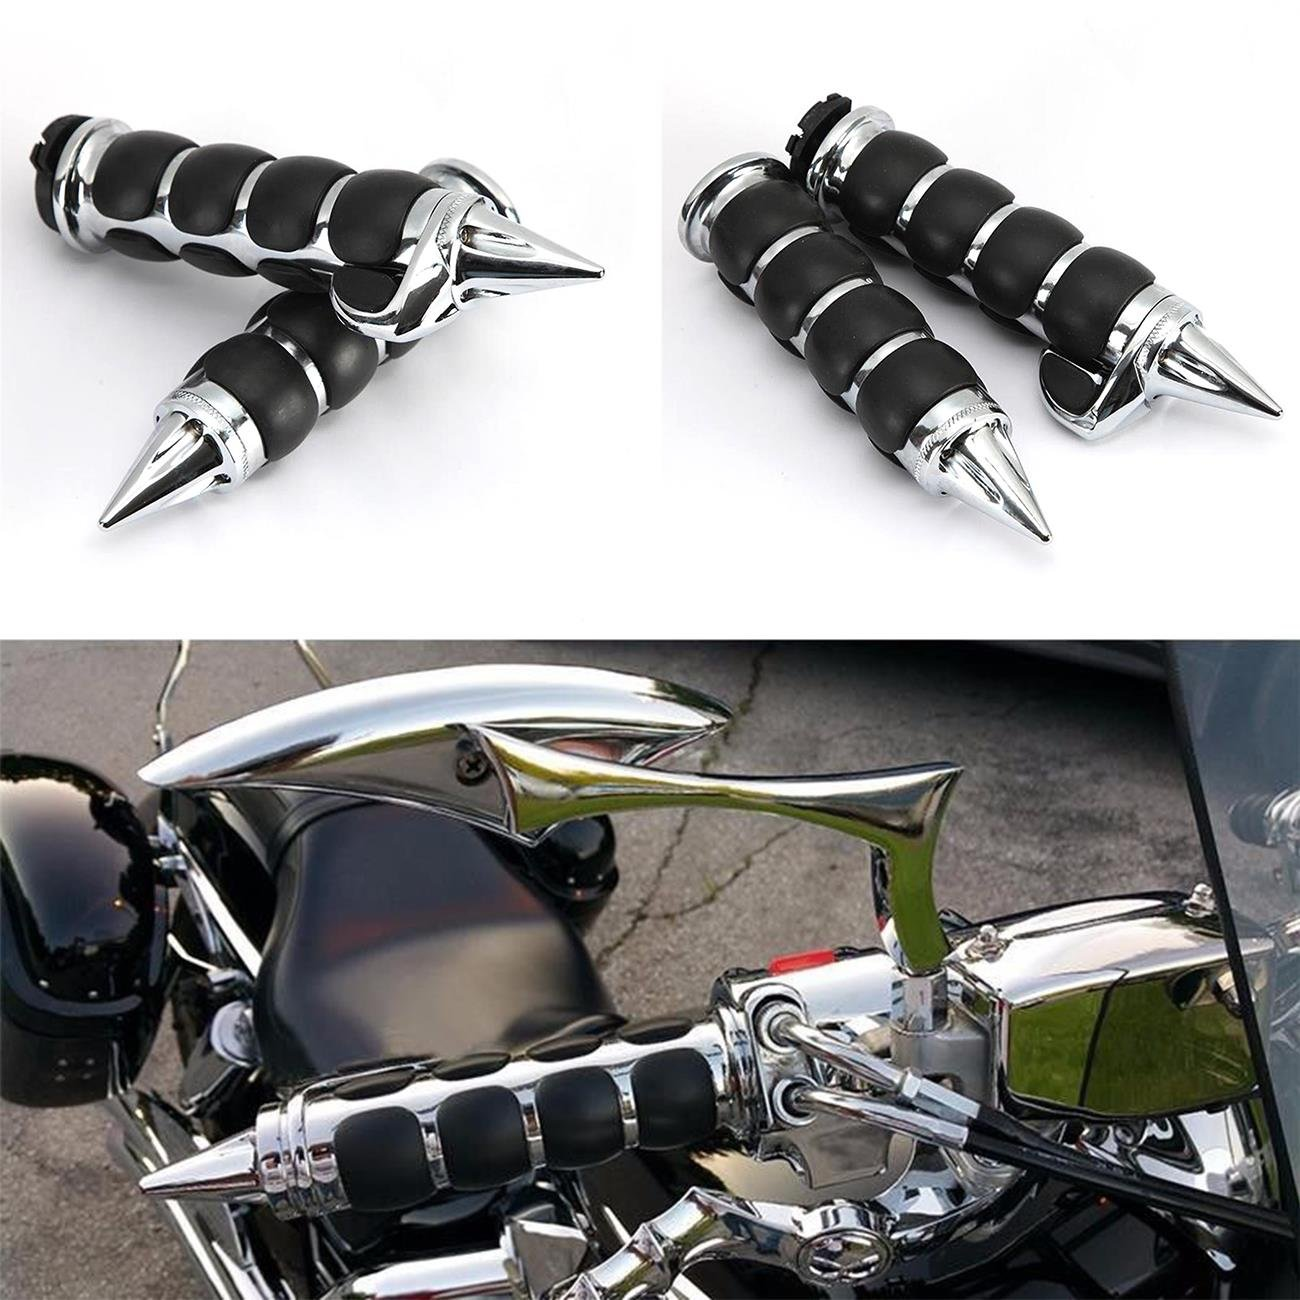 INNOGLOW 7//8 Motorcycle Molded Rubber Black Hand Handlebar Grips Grip Fits for Cruisers Choppers Harley Davidson Suzuki Kawasaki Yamaha Honda w// 7//8 inch